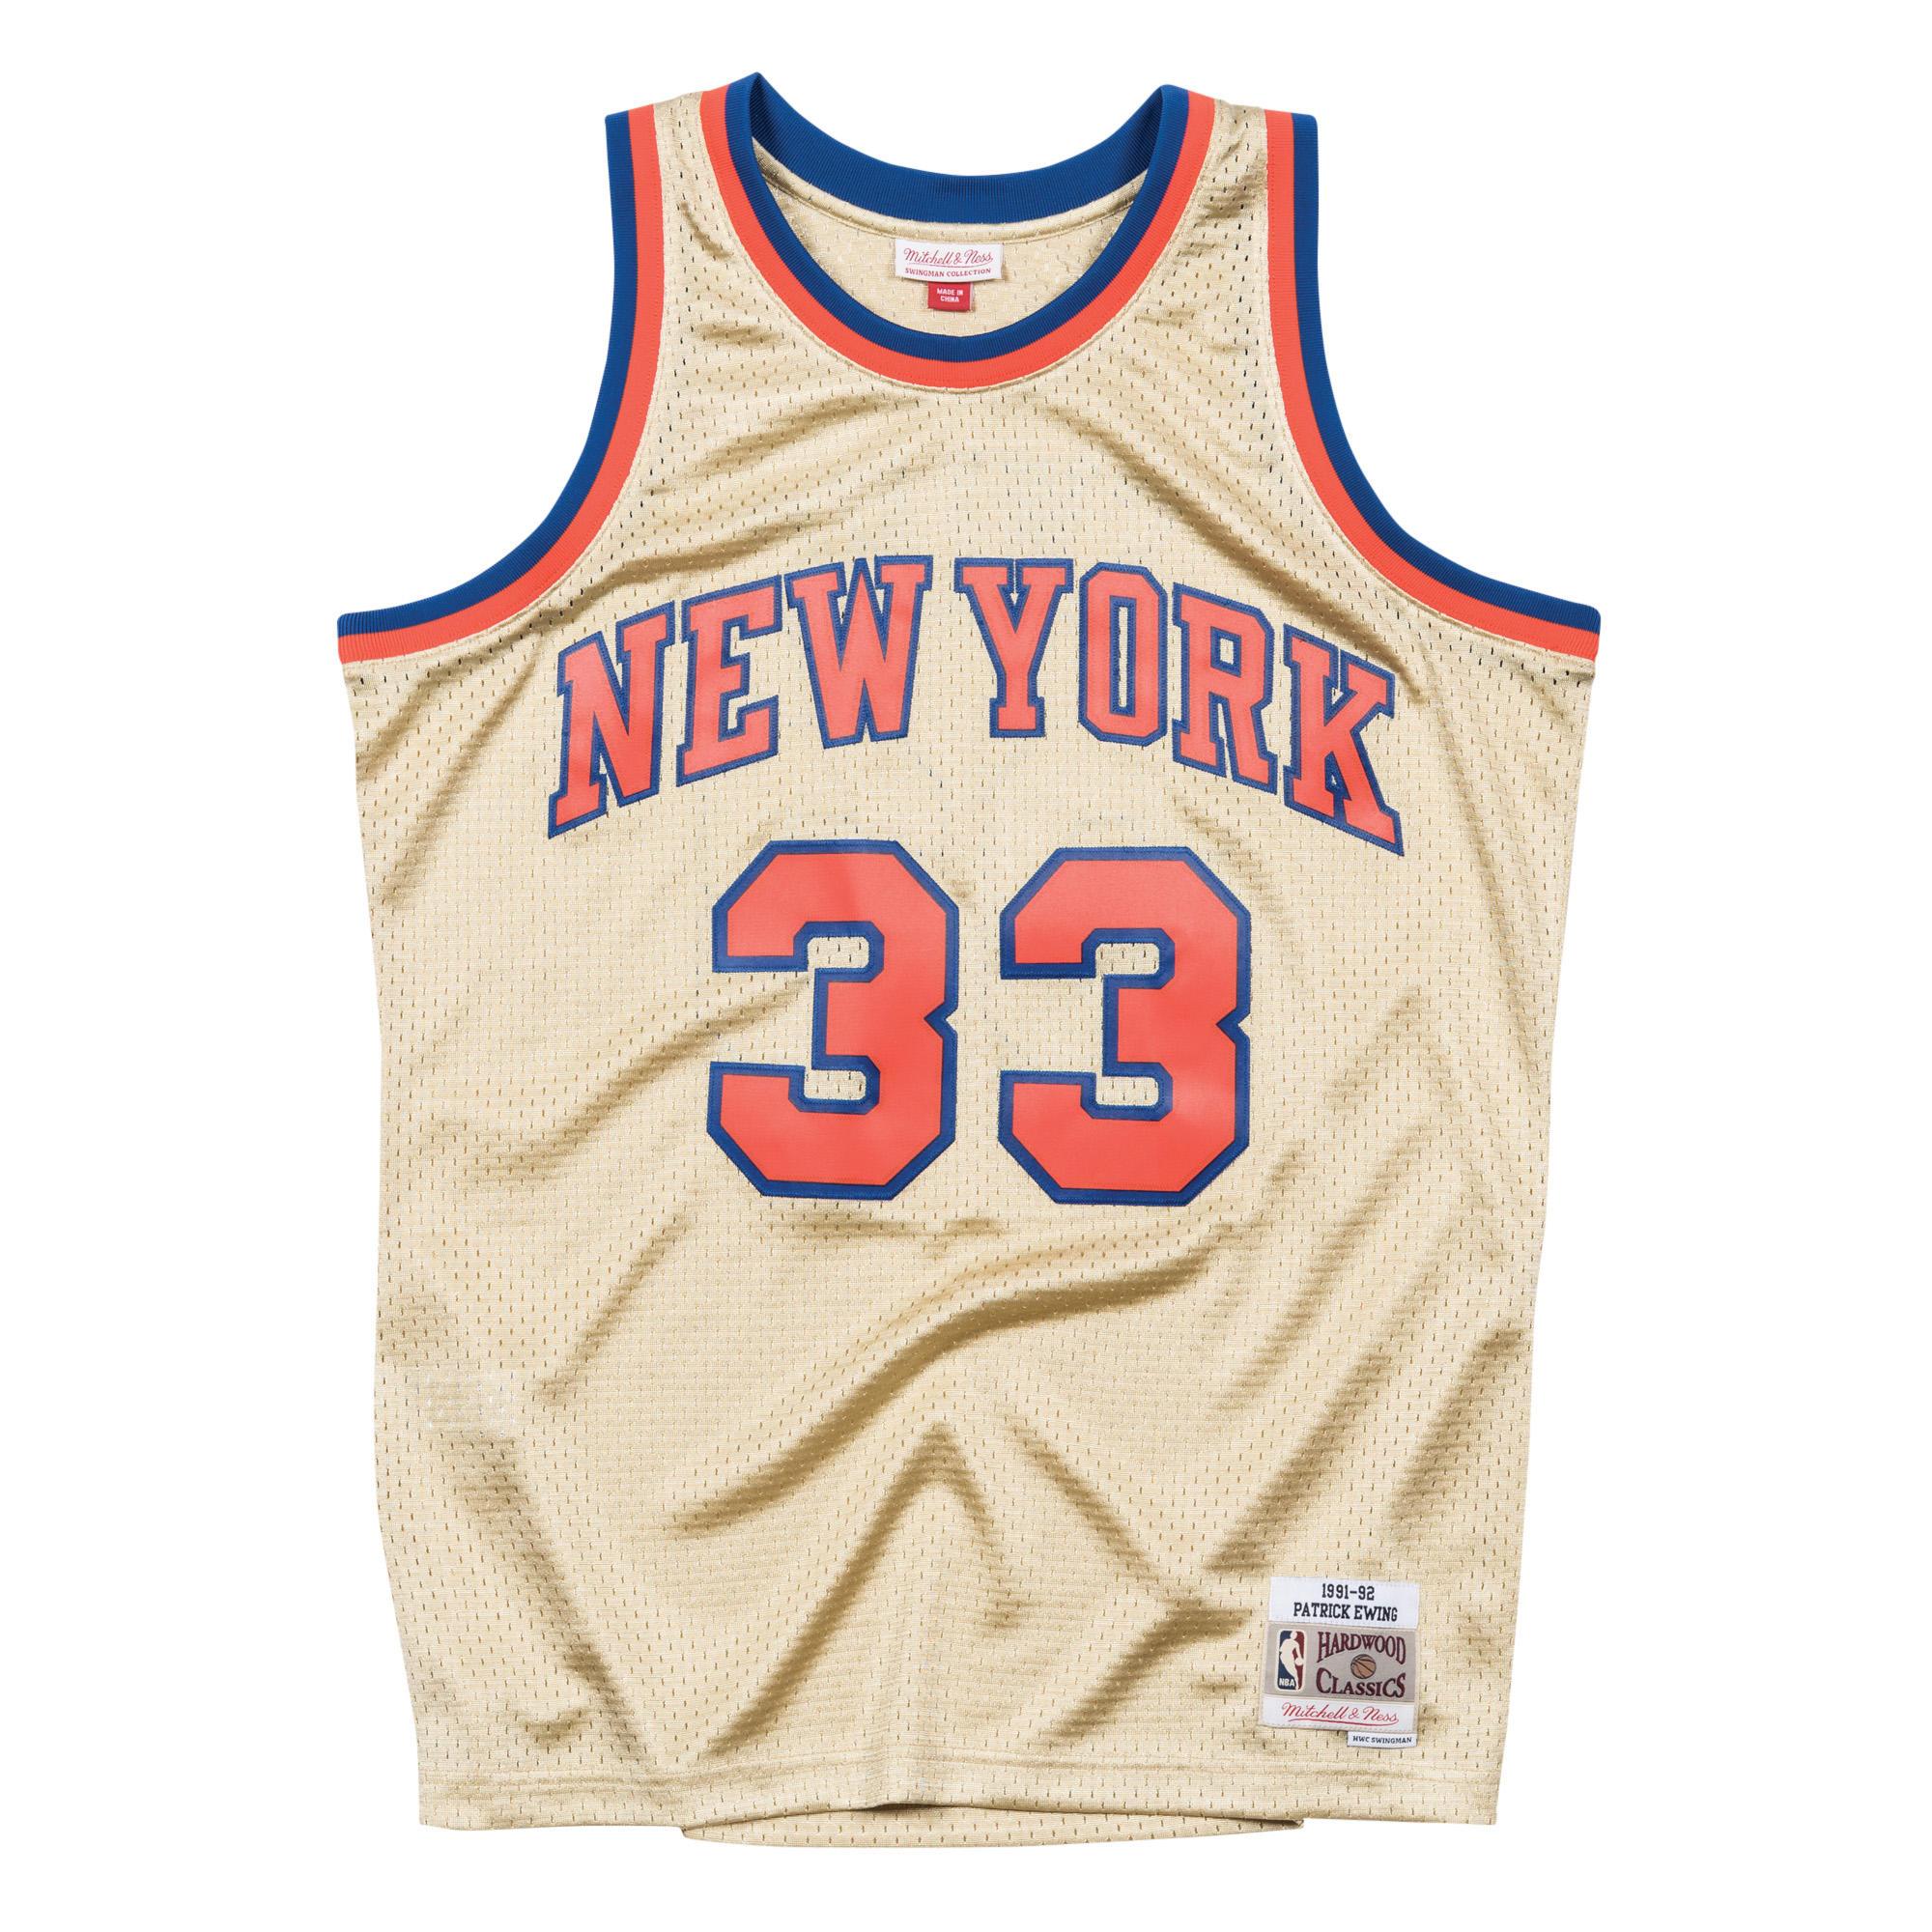 best service 4595e 90cc9 Mitchell & Ness Nostalgia Co. | Patrick Ewing 1991-92 Gold ...